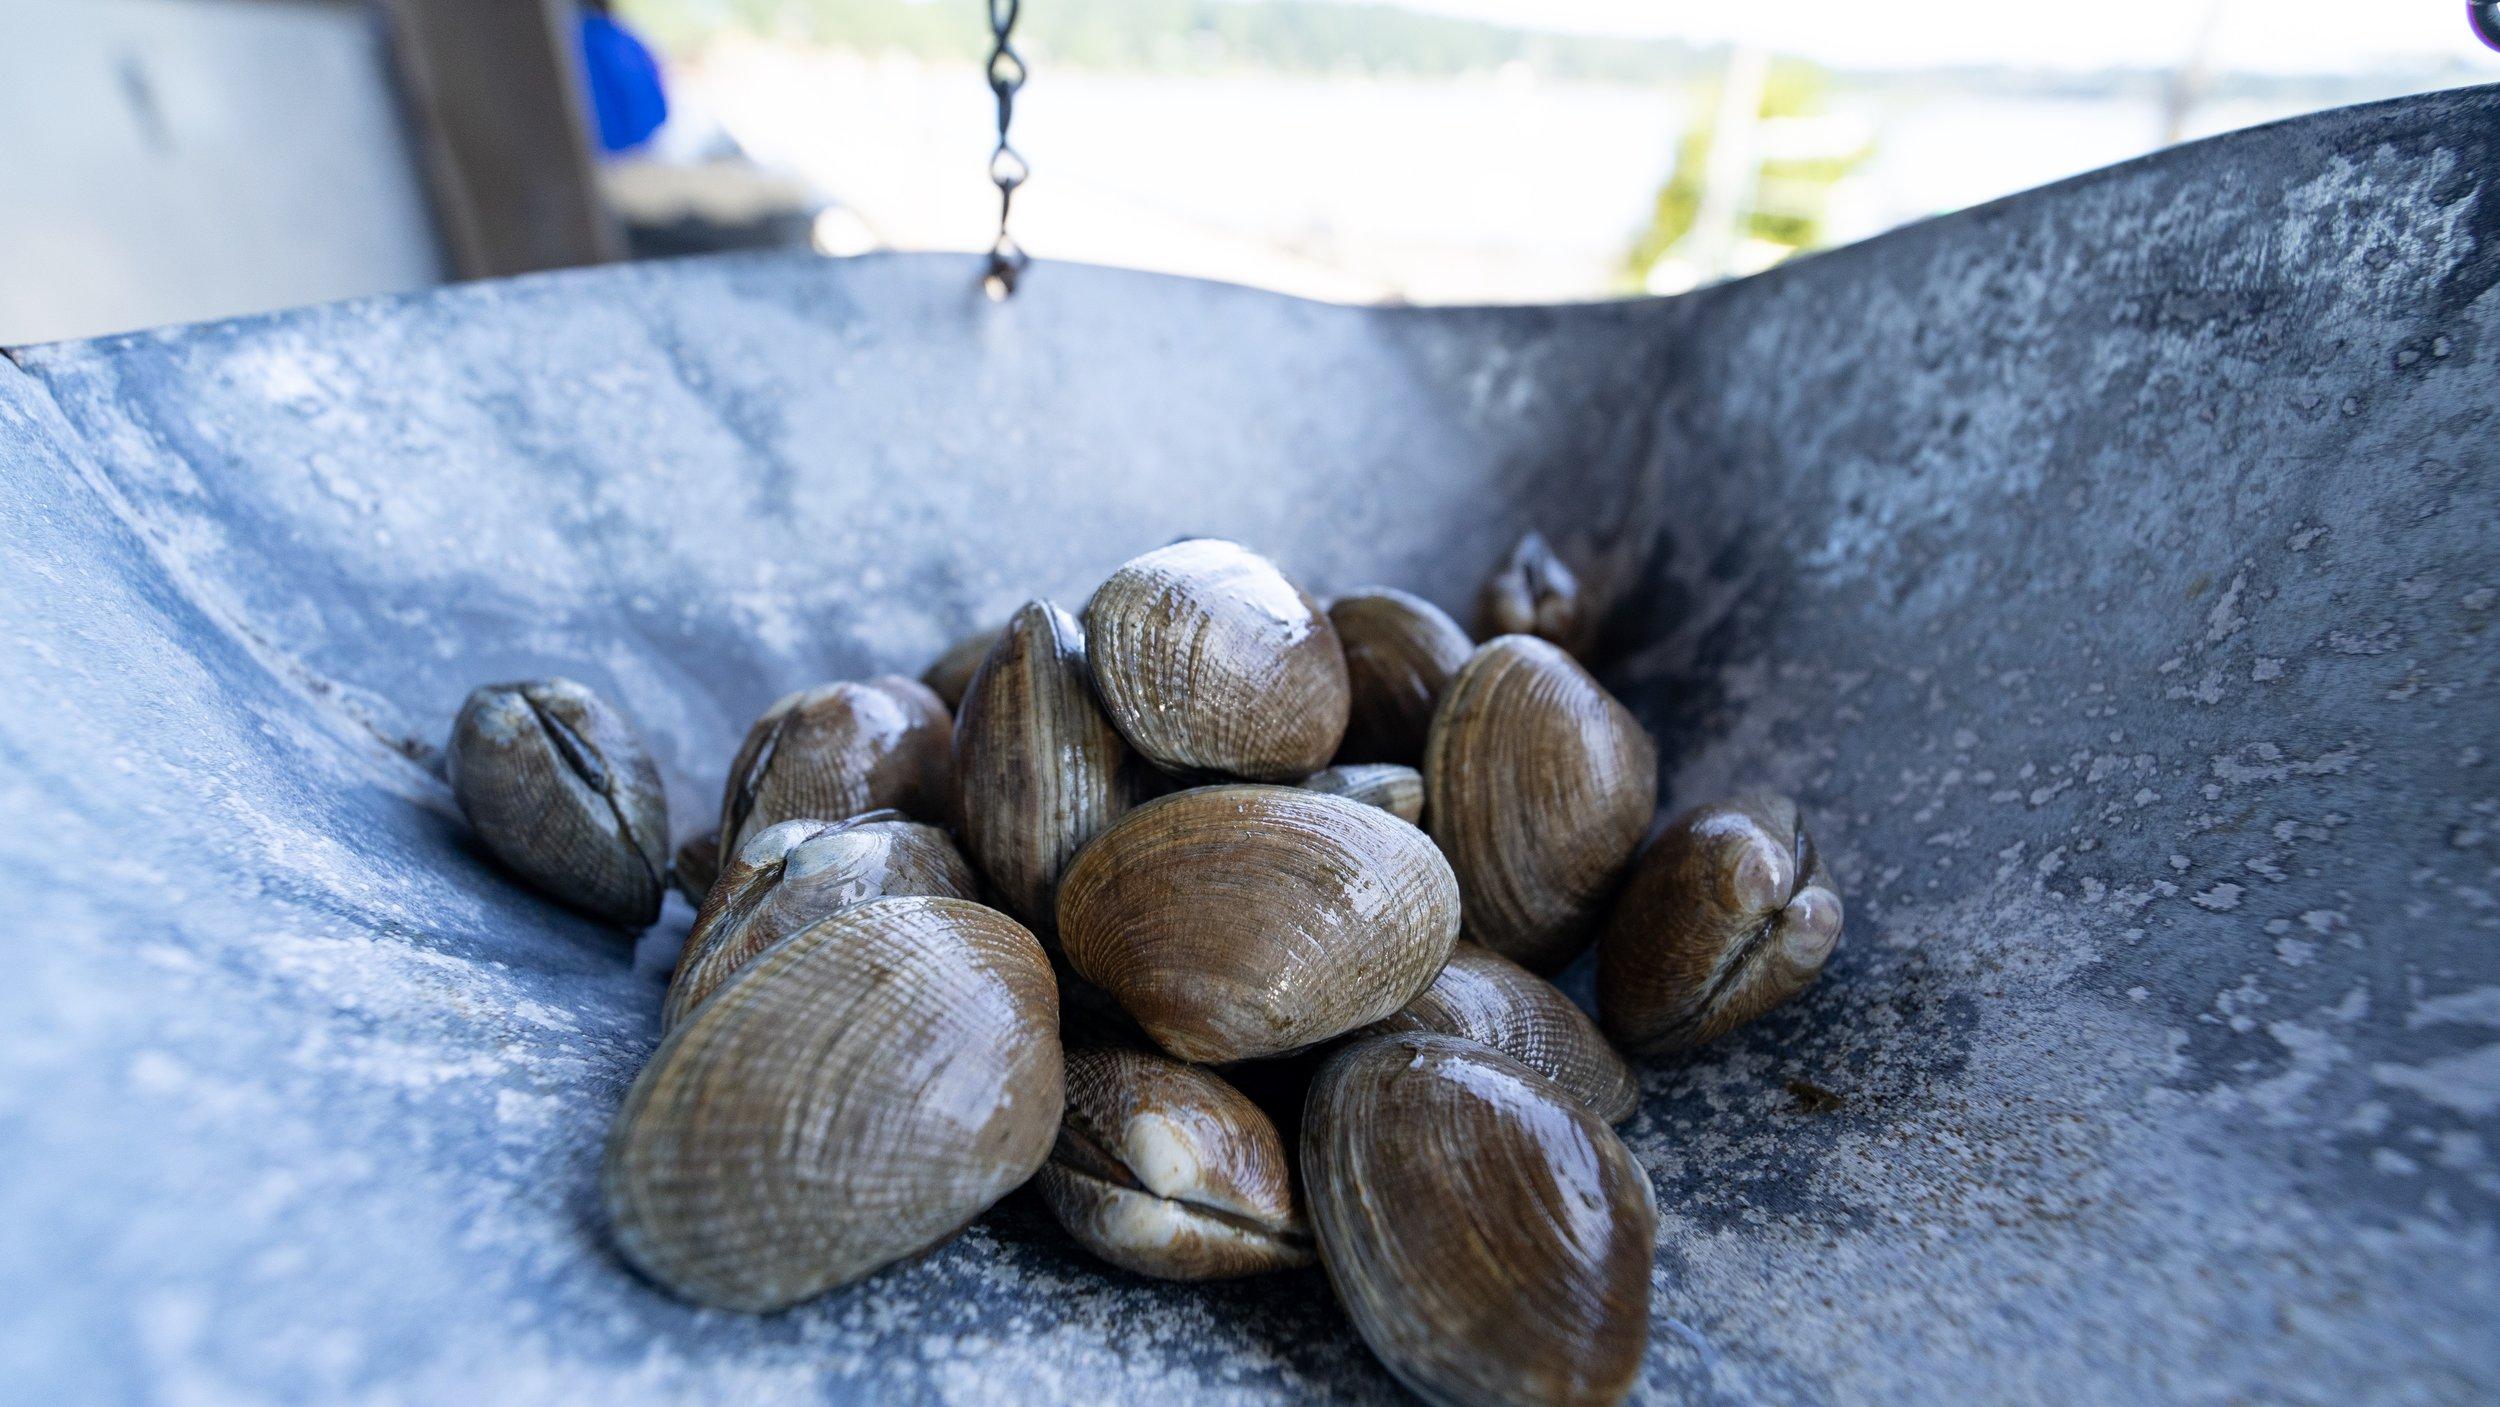 clams_westcott_bay_shellfish.jpg